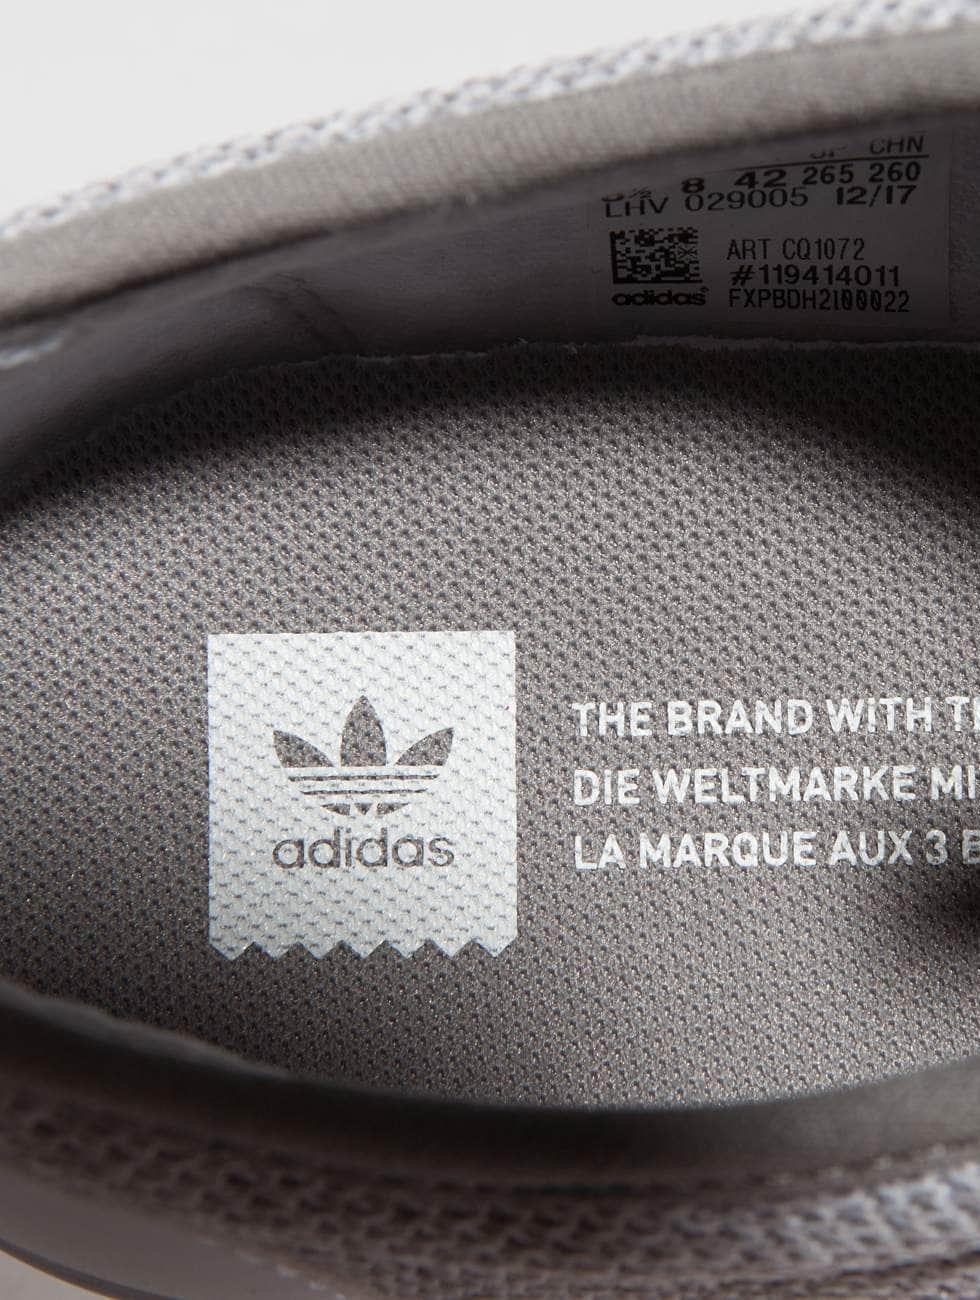 adidas originals schoen / sneaker Adi-Ease-Kung-Fu in grijs 410095 Outlet Lage Prijzen Es0j8V5